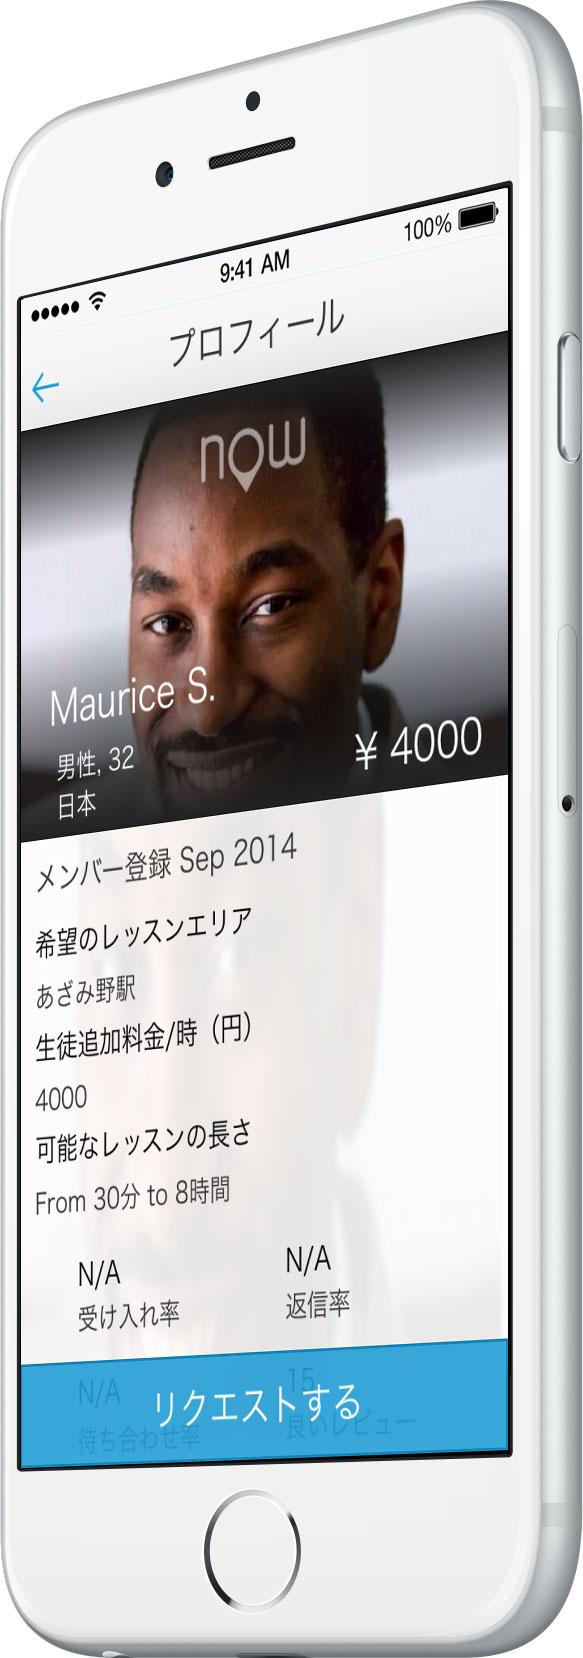 teacher_Maurice.jpg